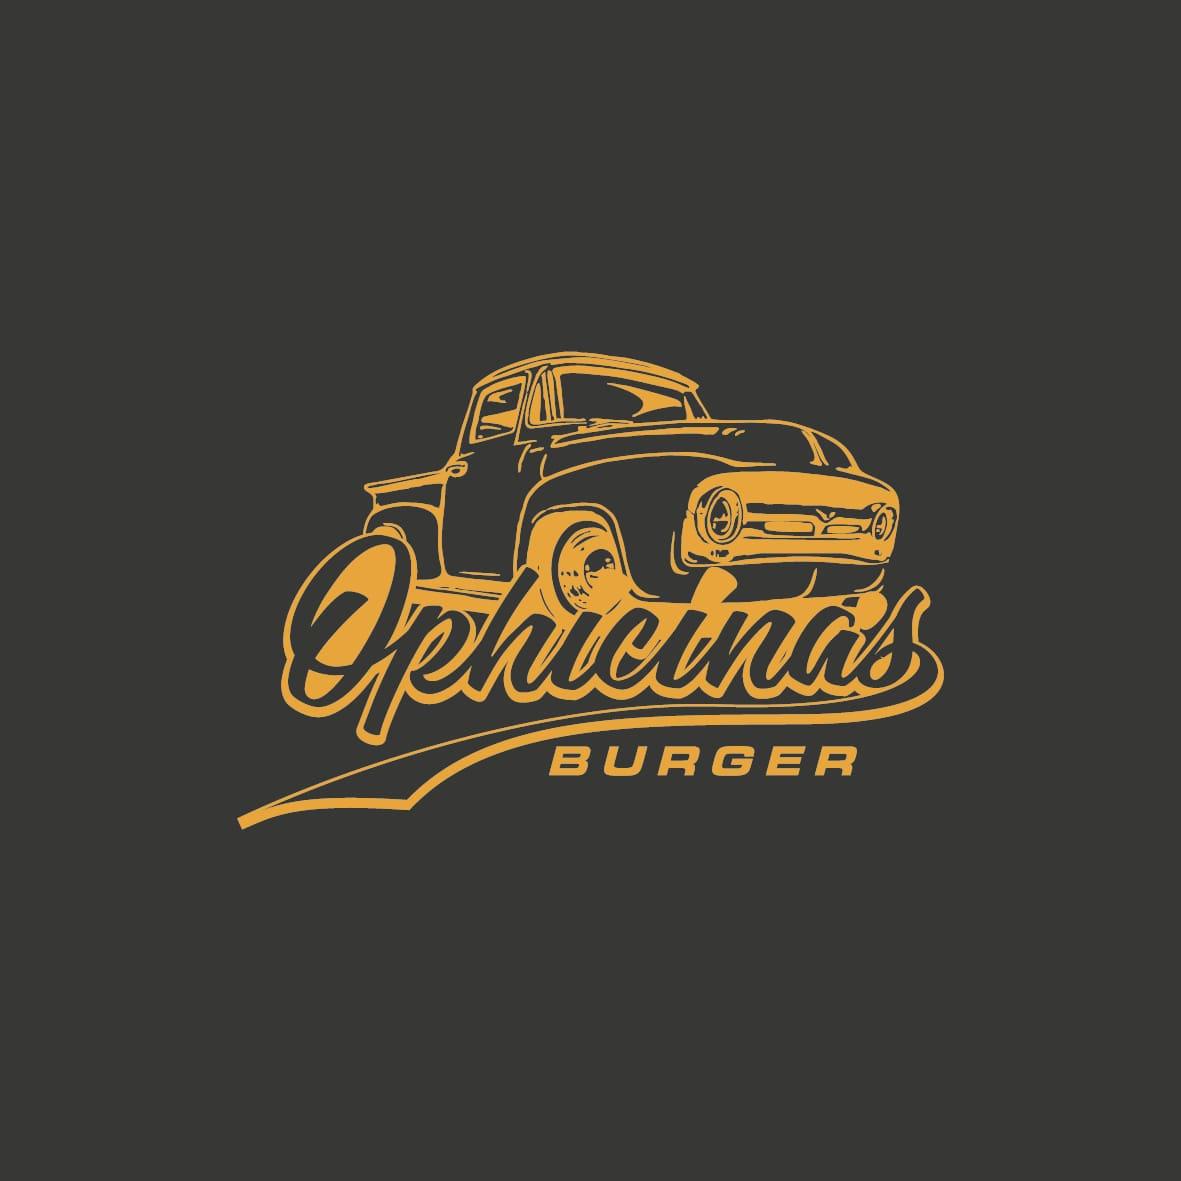 Ophicina's Burger